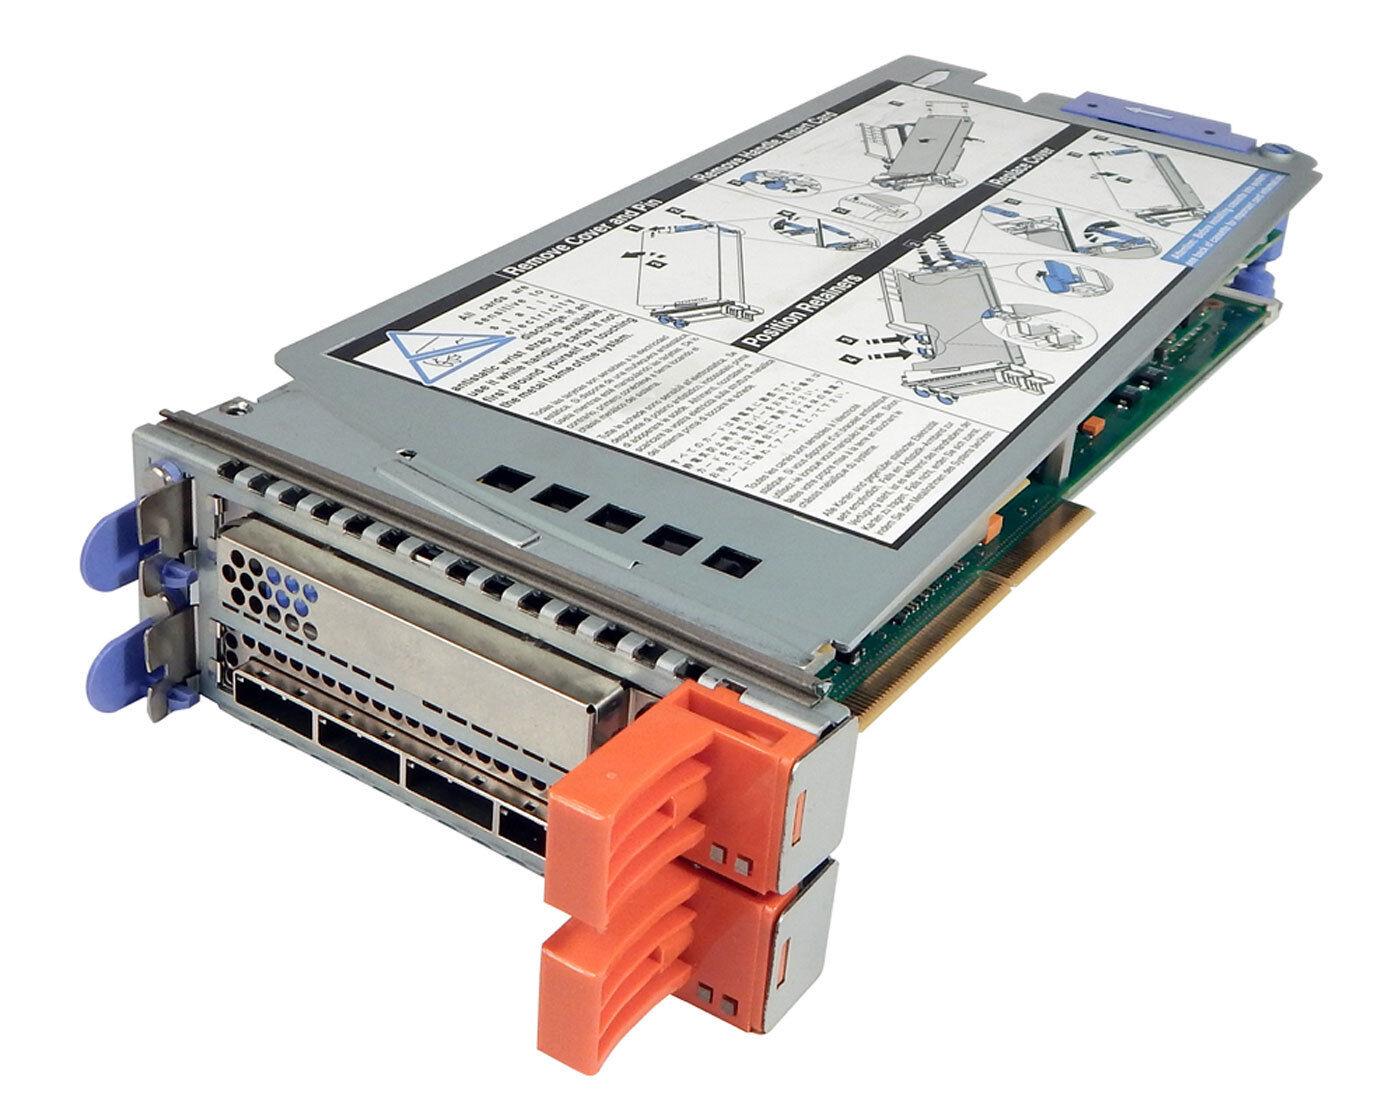 IBM 8202 575C 1.5Gb PCIx SAS Raid Adapter 46K4734 FRU: 46k6114